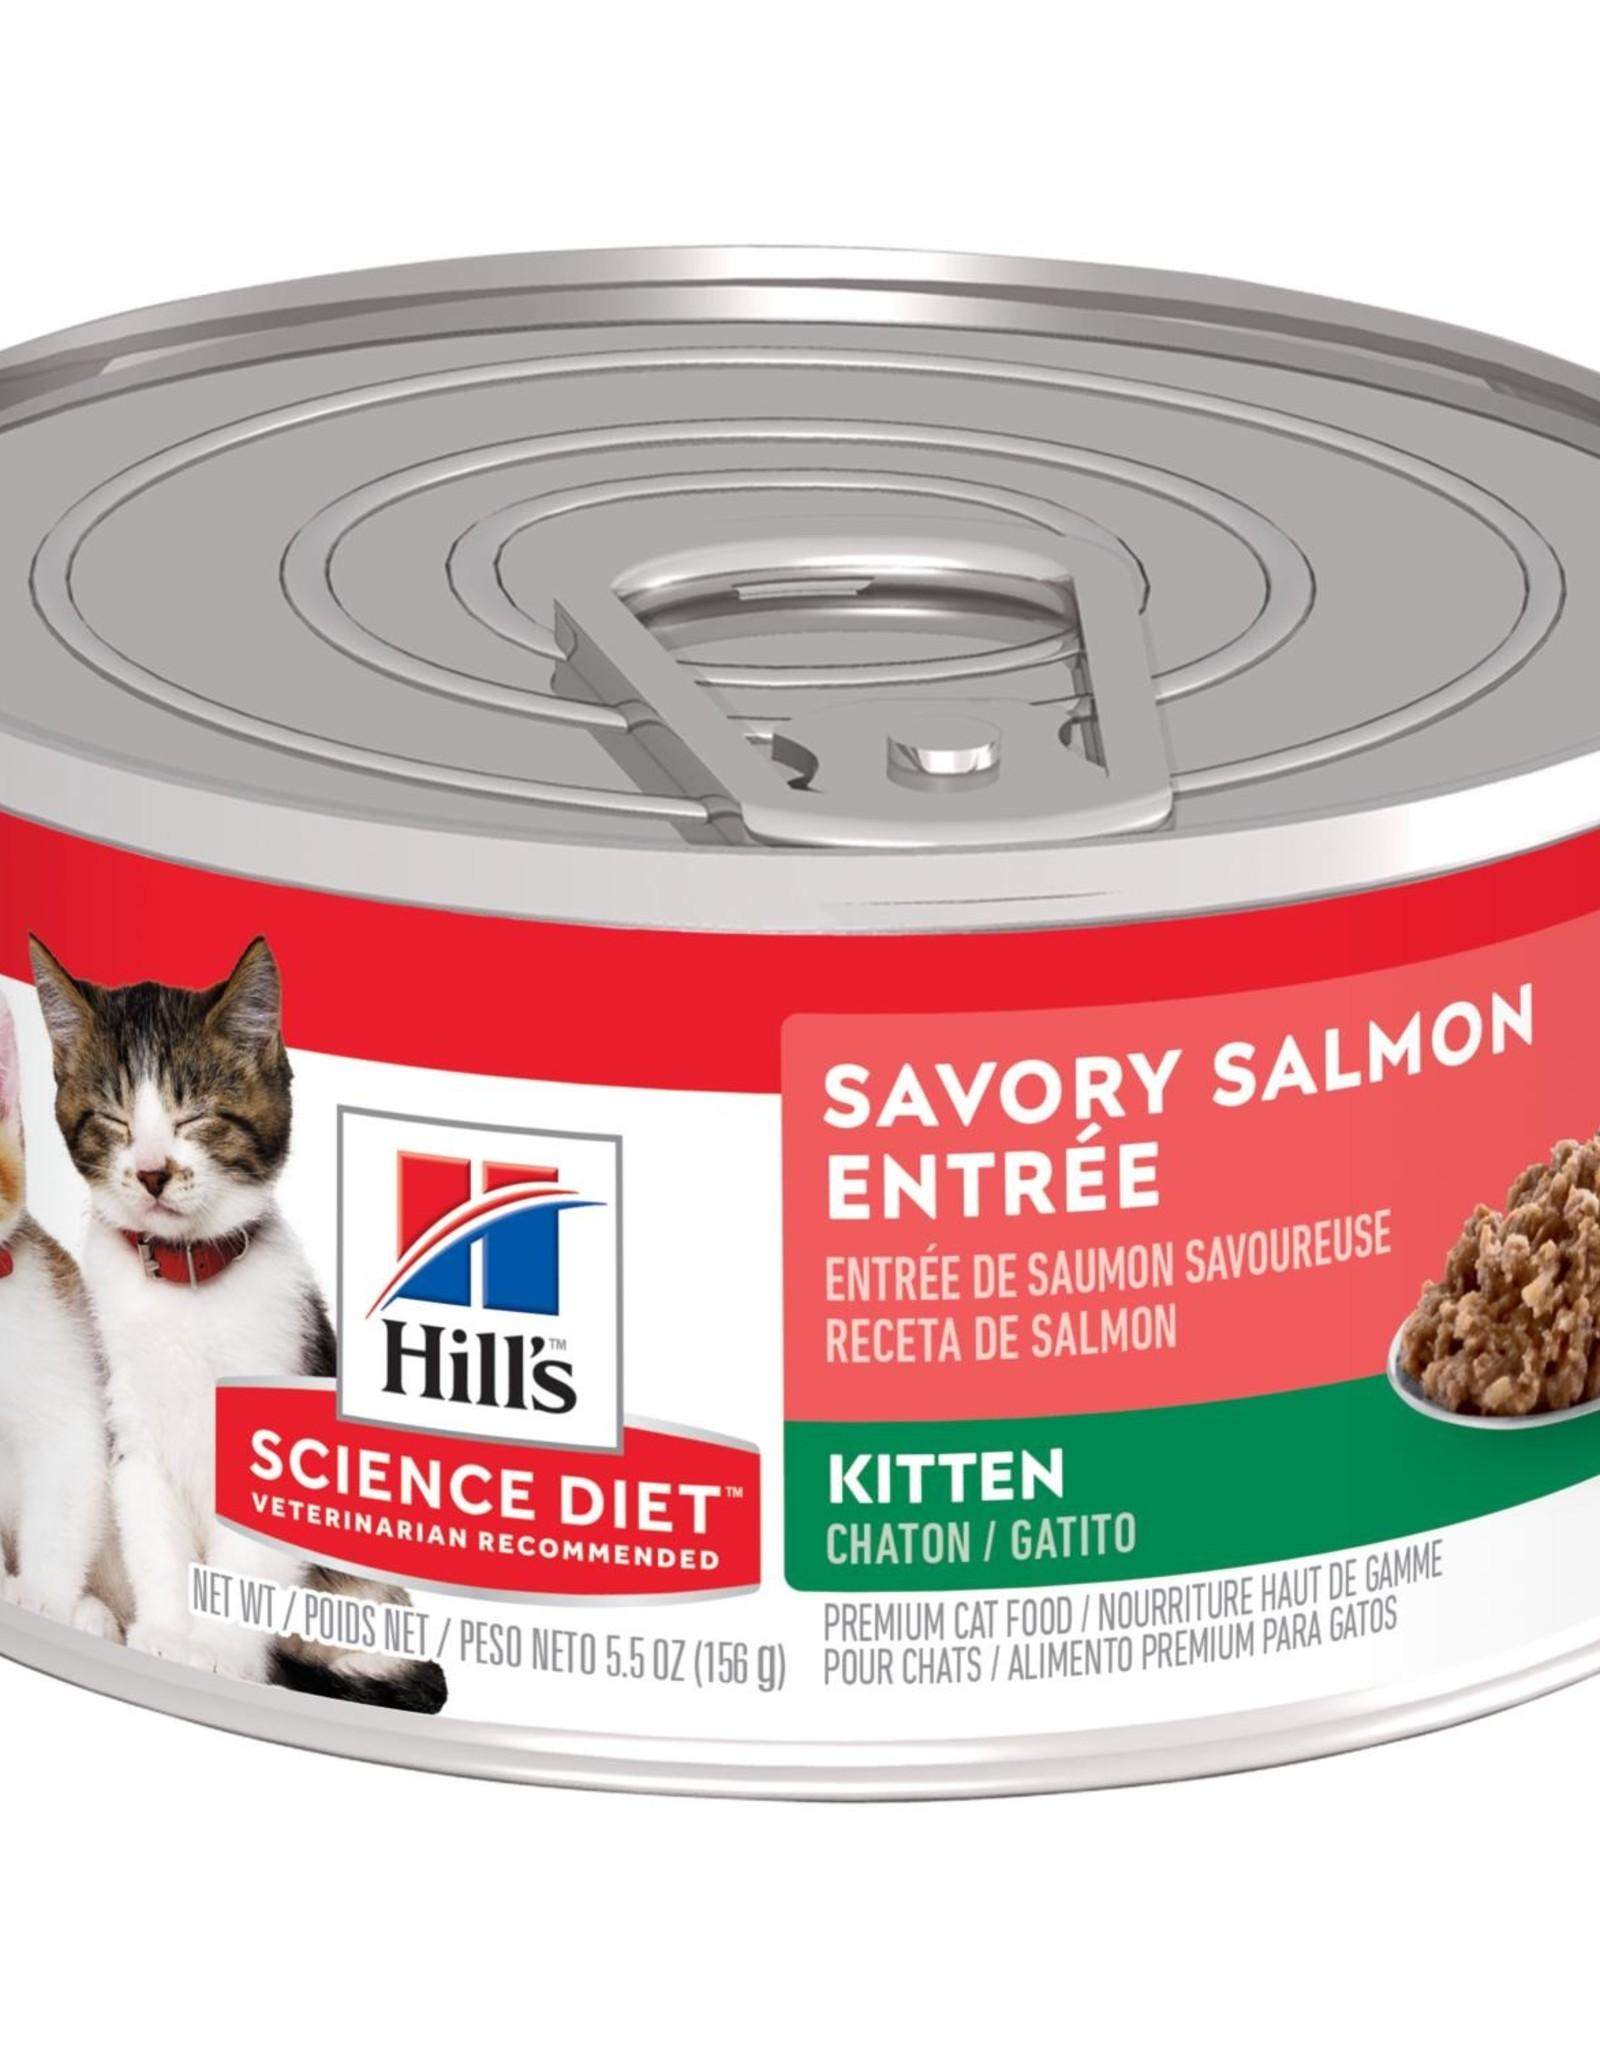 SCIENCE DIET HILL'S SCIENCE DIET FELINE CAN KITTEN SAVORY SALMON 5.5OZ CASE OF 24